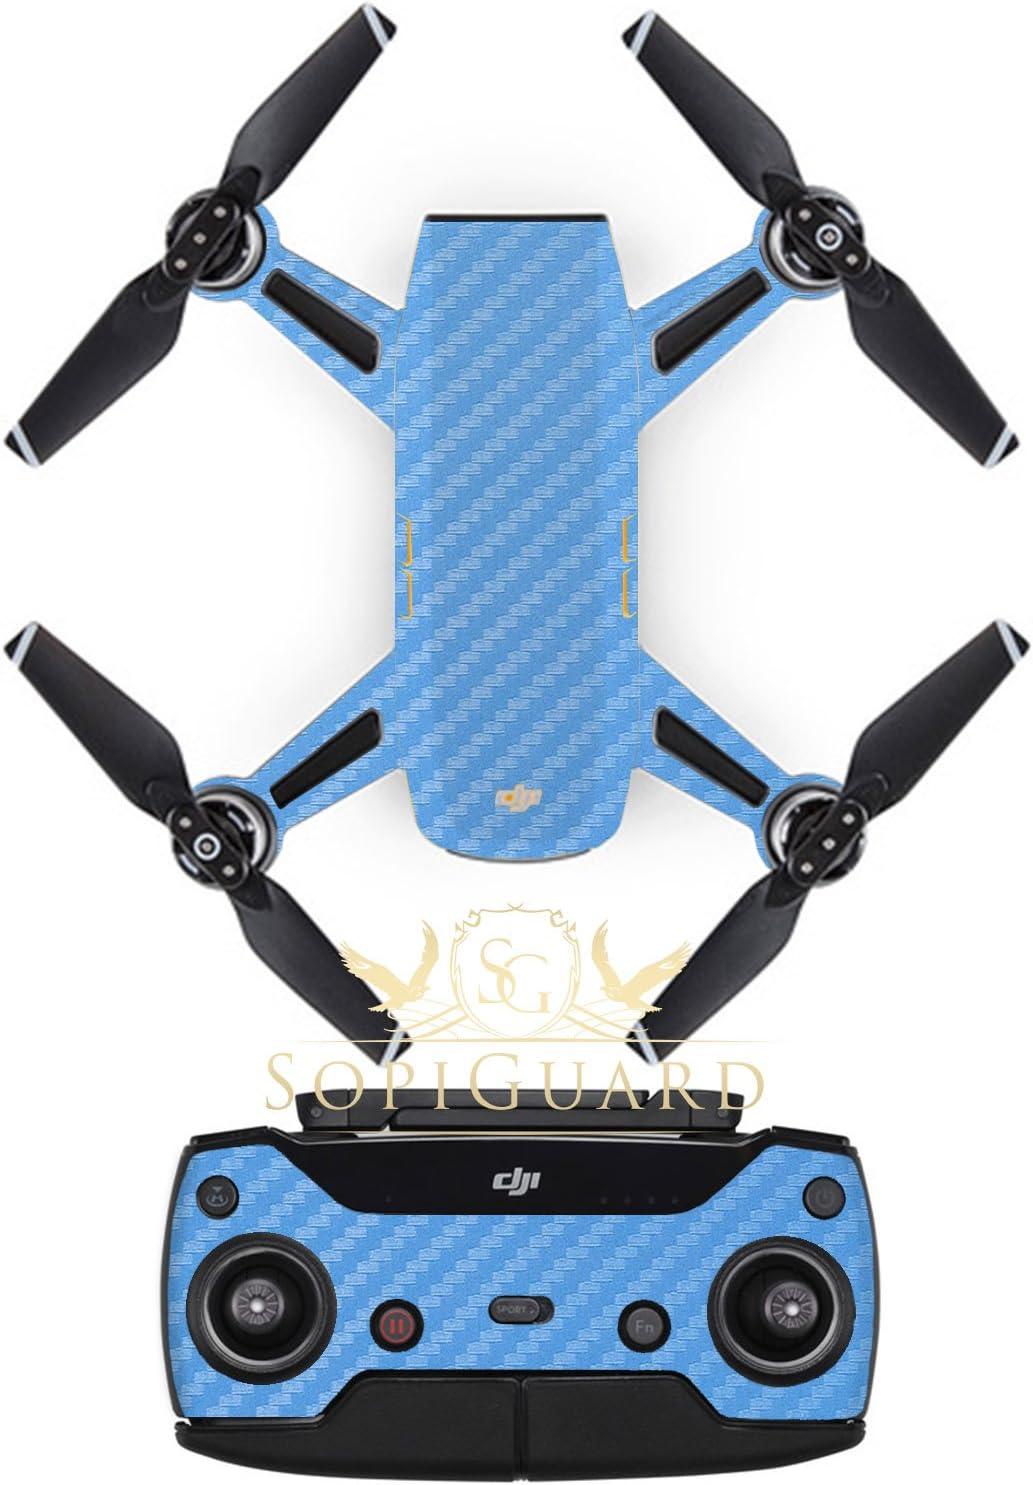 SopiGuard Sky Blue Carbon Fiber Precision Edge-to-Edge Coverage Vinyl Sticker Skin Controller 3 x Battery Wraps for DJI Spark